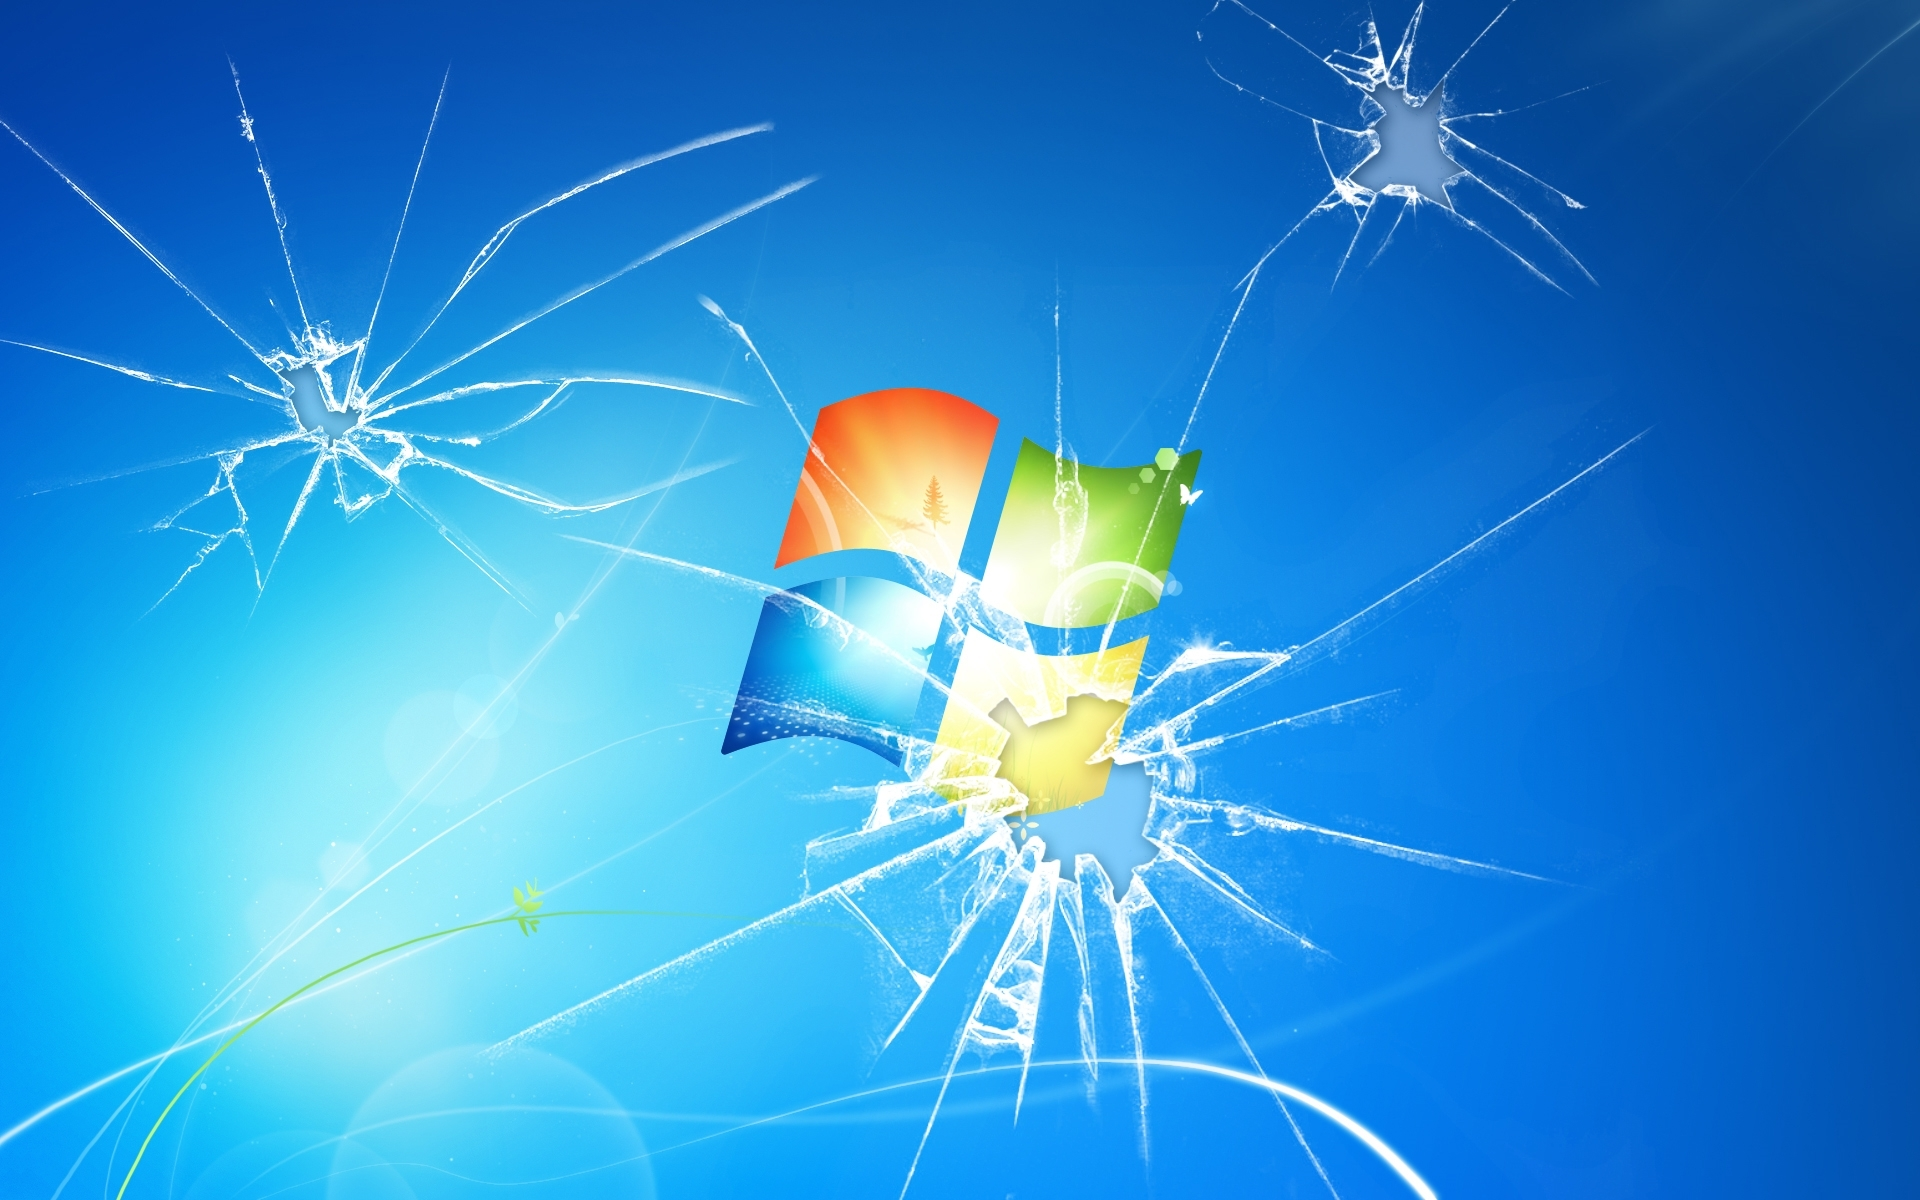 broken-cracked-screen-windows-7-desktop-wallpaper - wallpaper.wiki